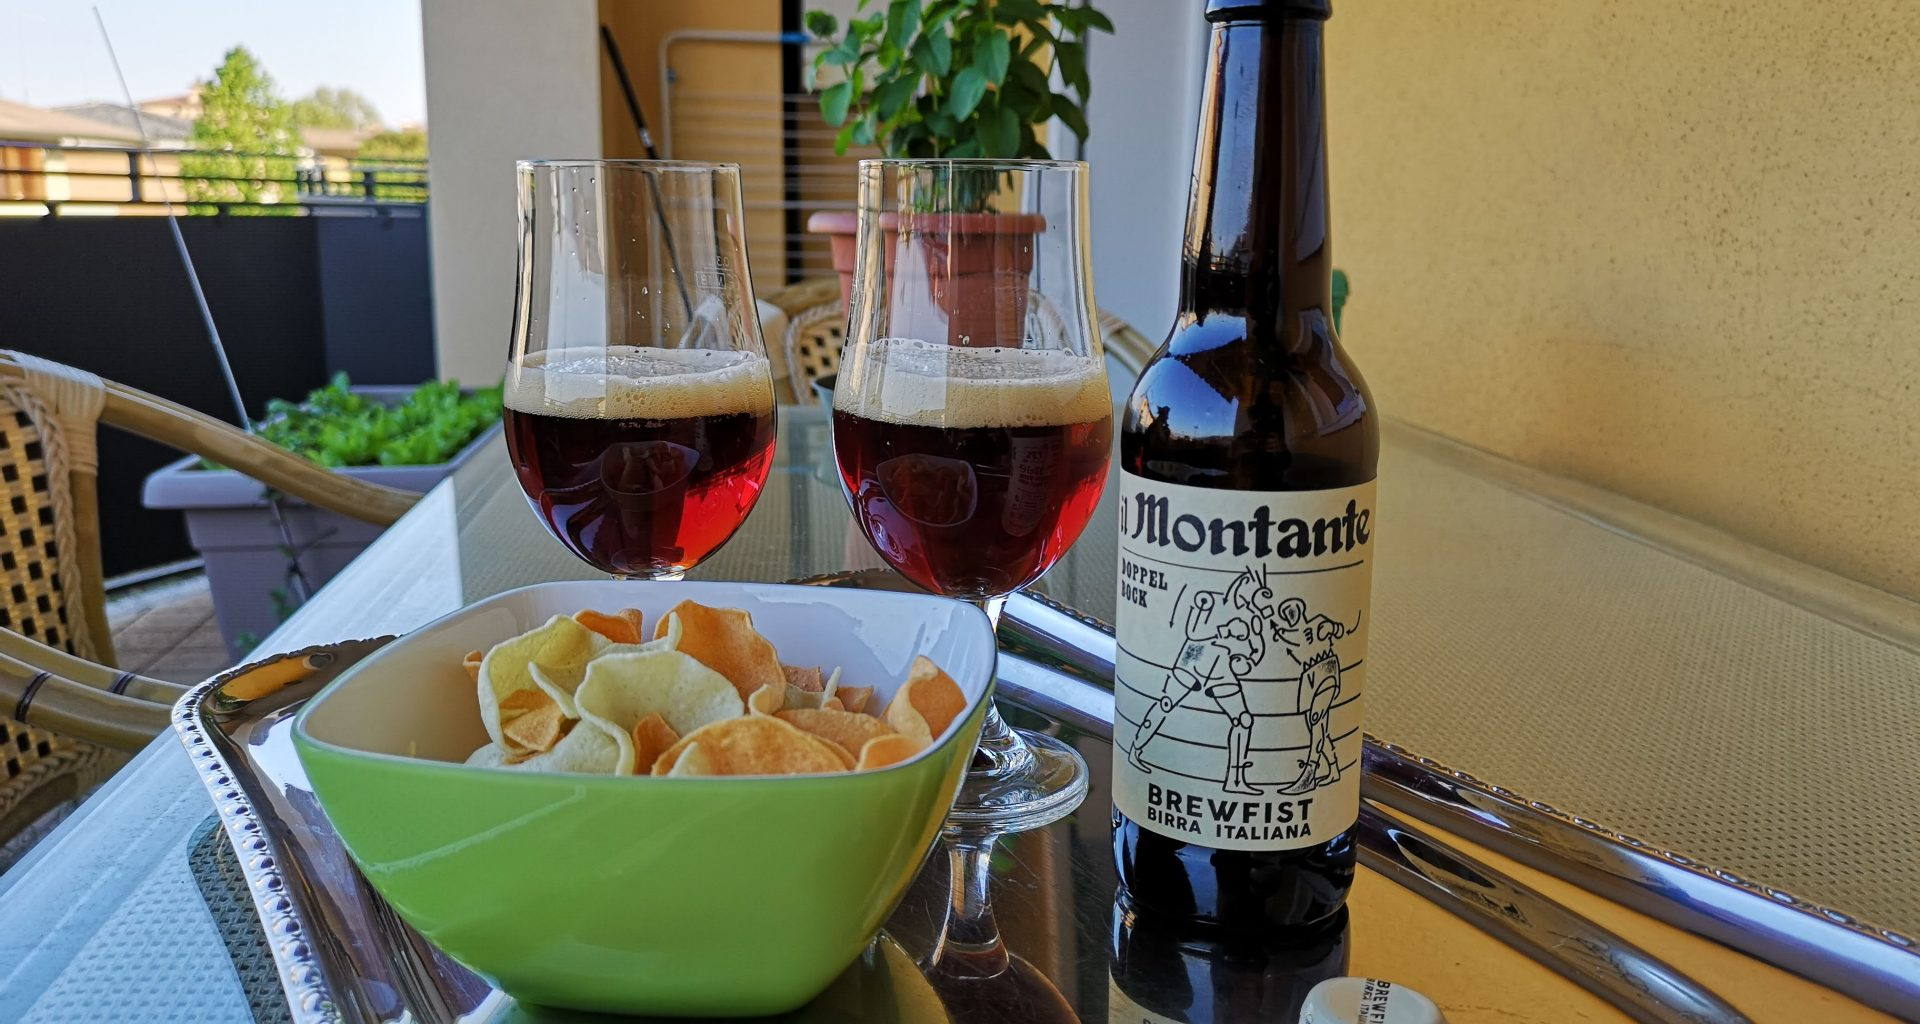 Il Montante - Brewfist